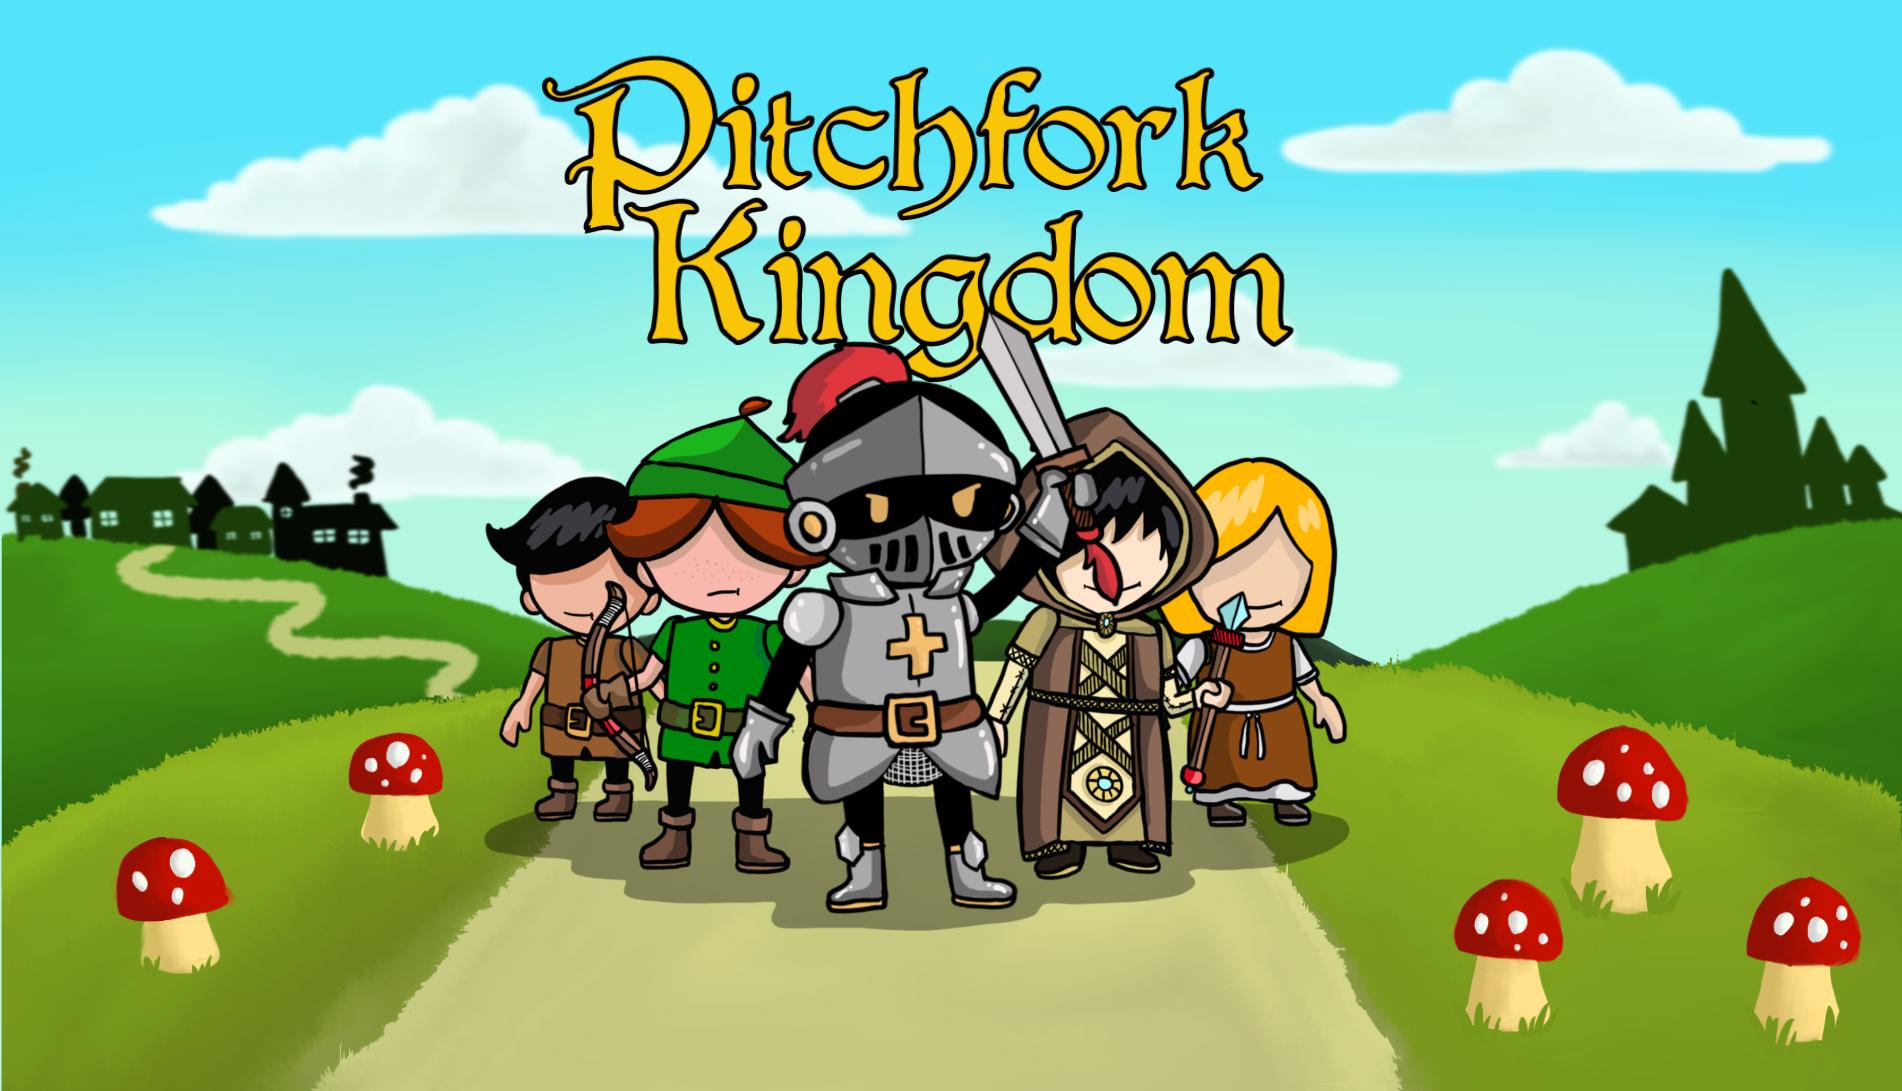 Pitchfork Kingdom